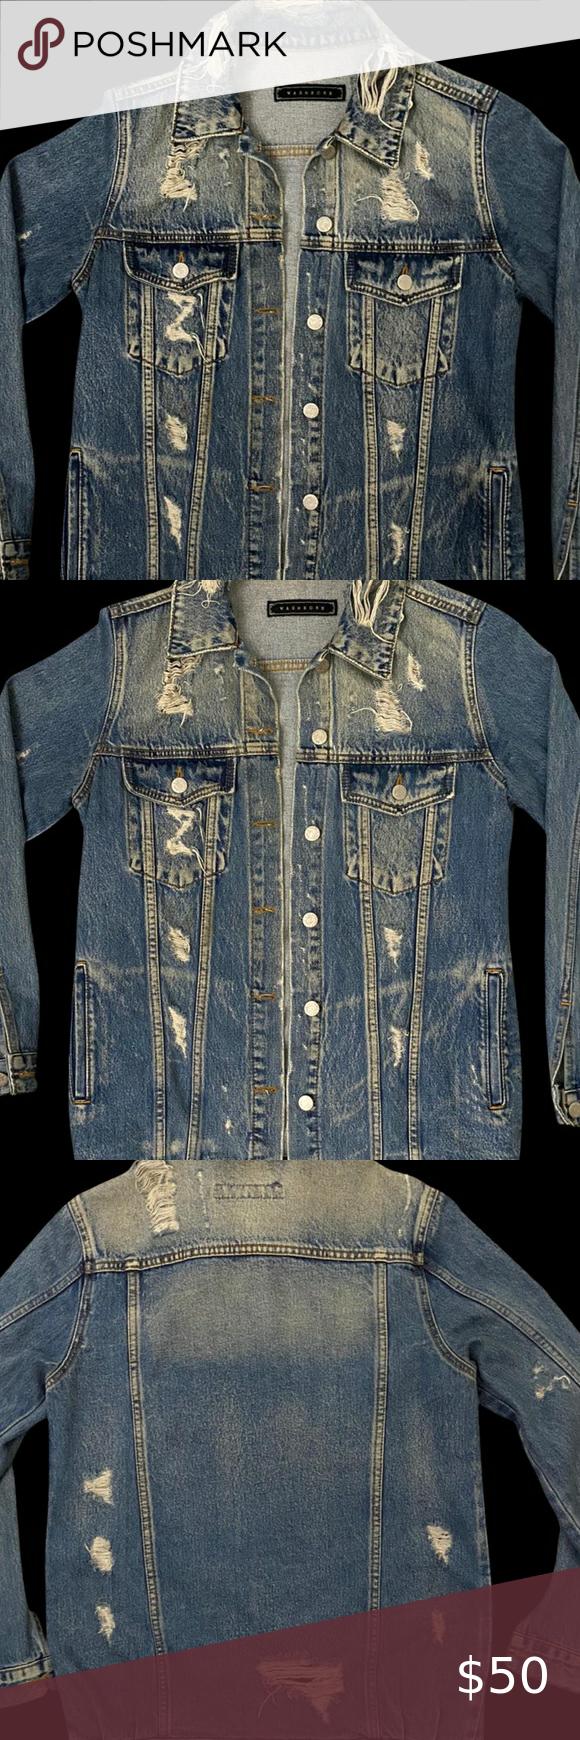 Washborn Denim Jacket Denim Jacket Urban Outfitters Jacket Embroidered Denim Jacket [ 1740 x 580 Pixel ]